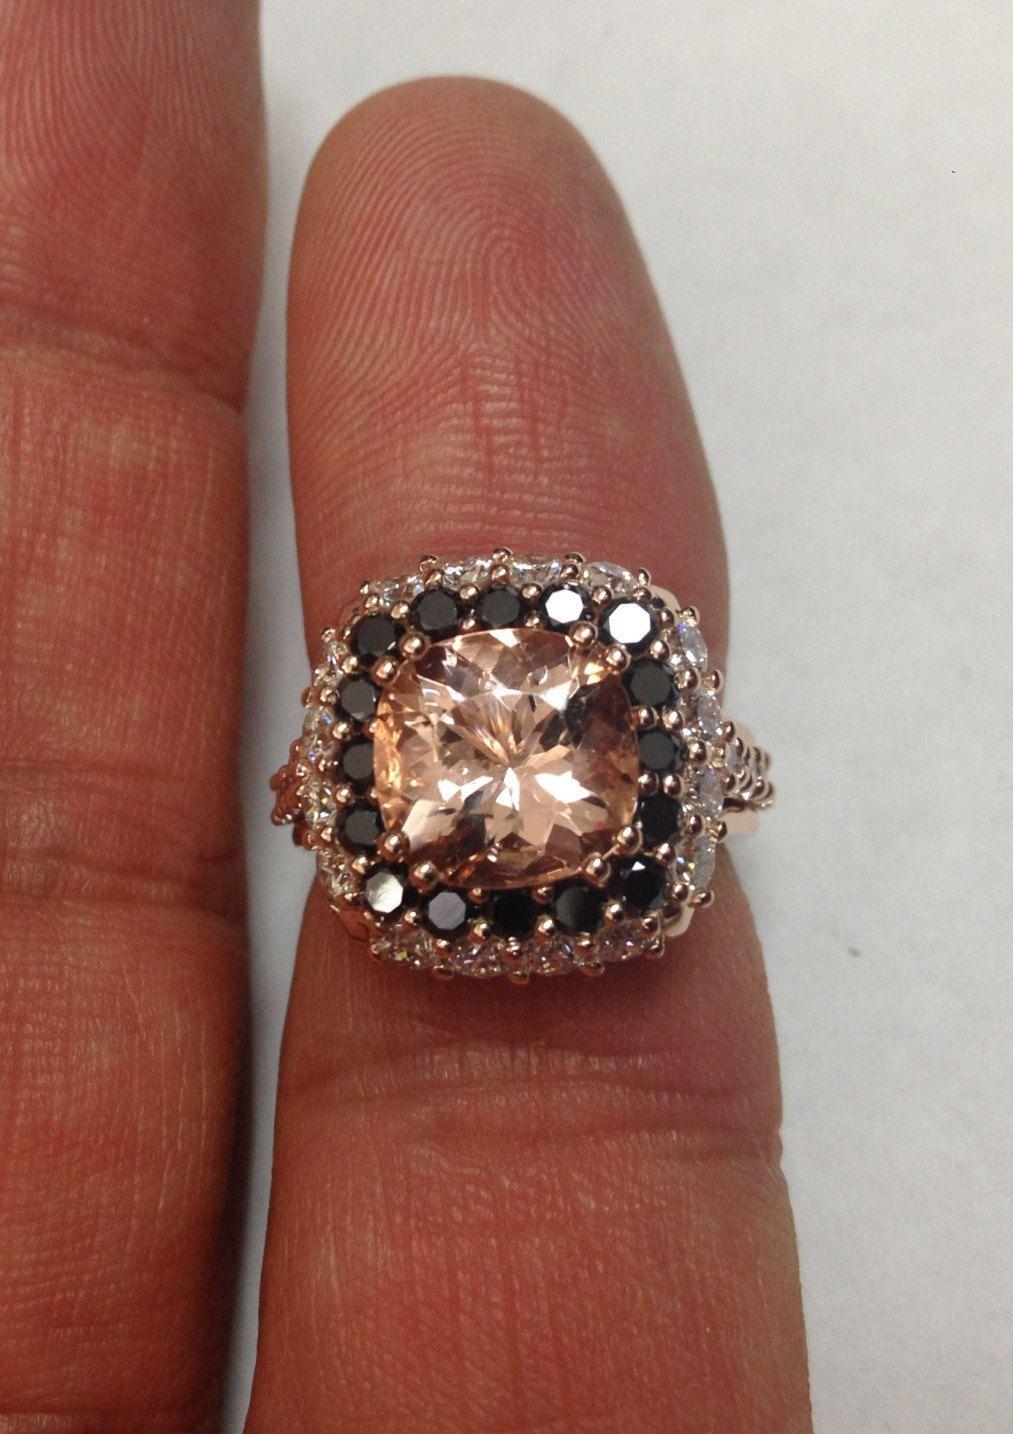 Unique Engagement Ring Black Diamond Wedding Ring Gemstone Engagement Ring 14K Rose Gold Ring Unique Gifts Morganite Fine Jewelry - V1096 by JewelryArtworkByVick on Etsy